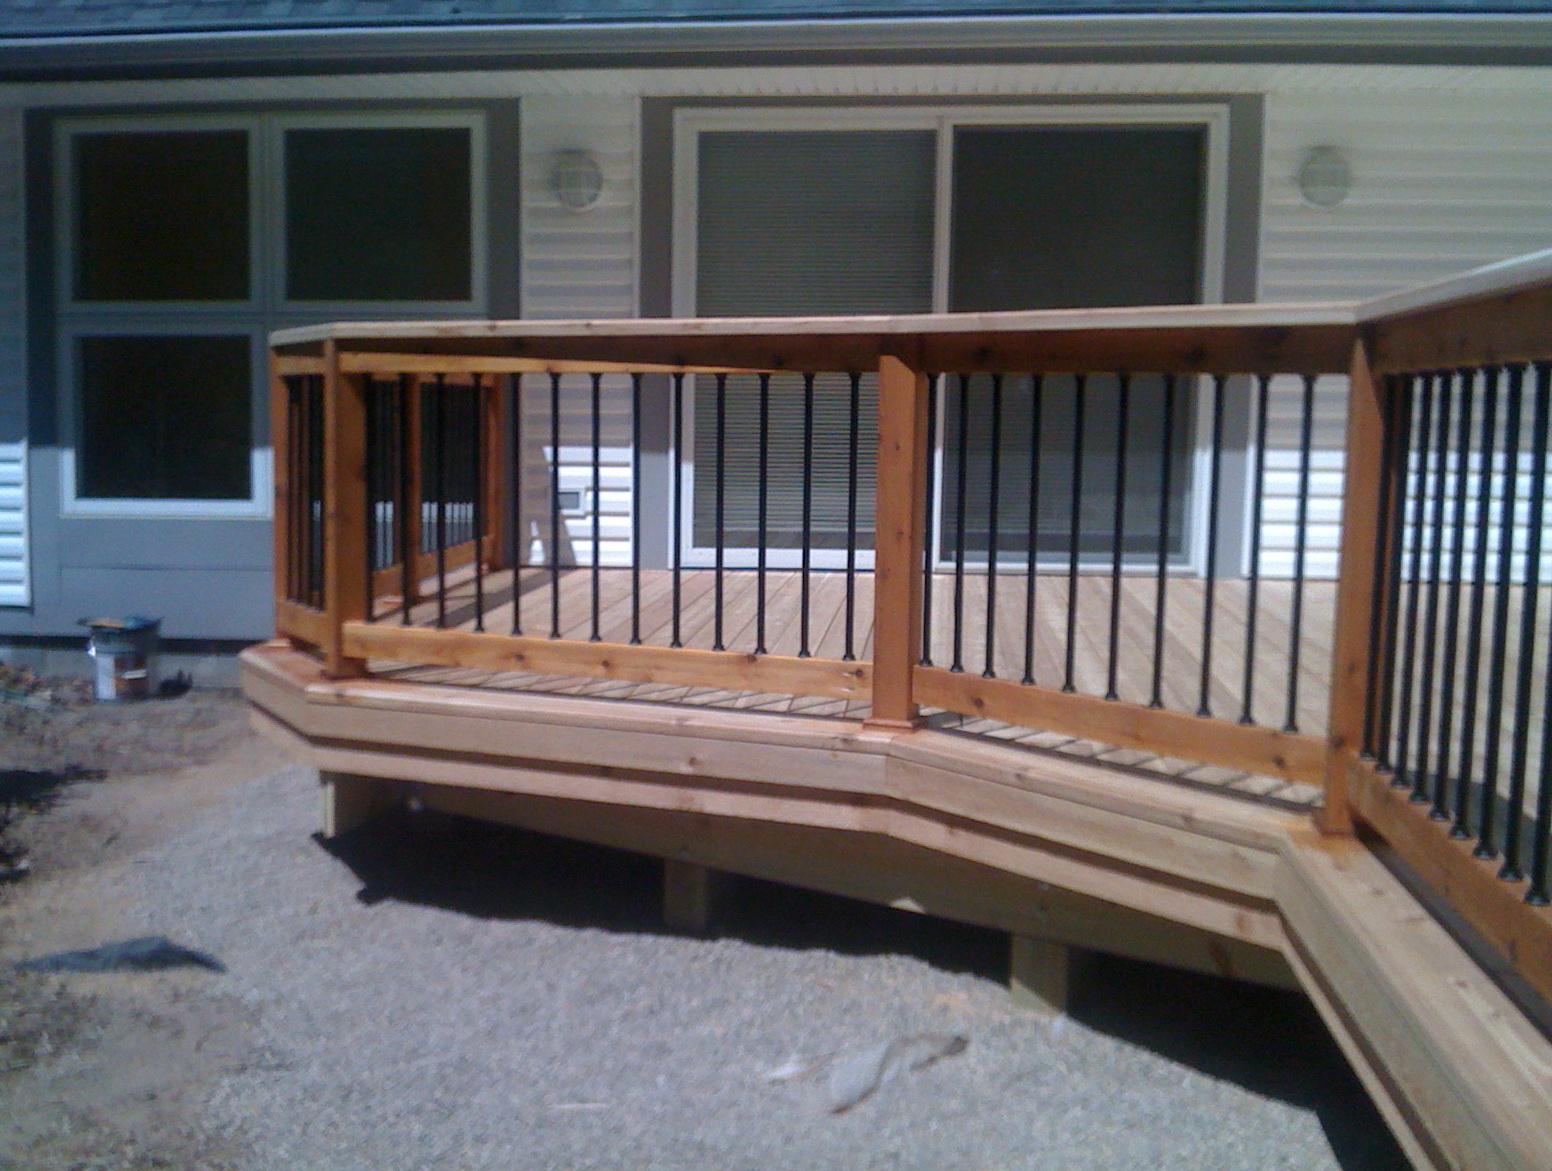 2 215 6 Deck Railing Ideas Home Design Ideas